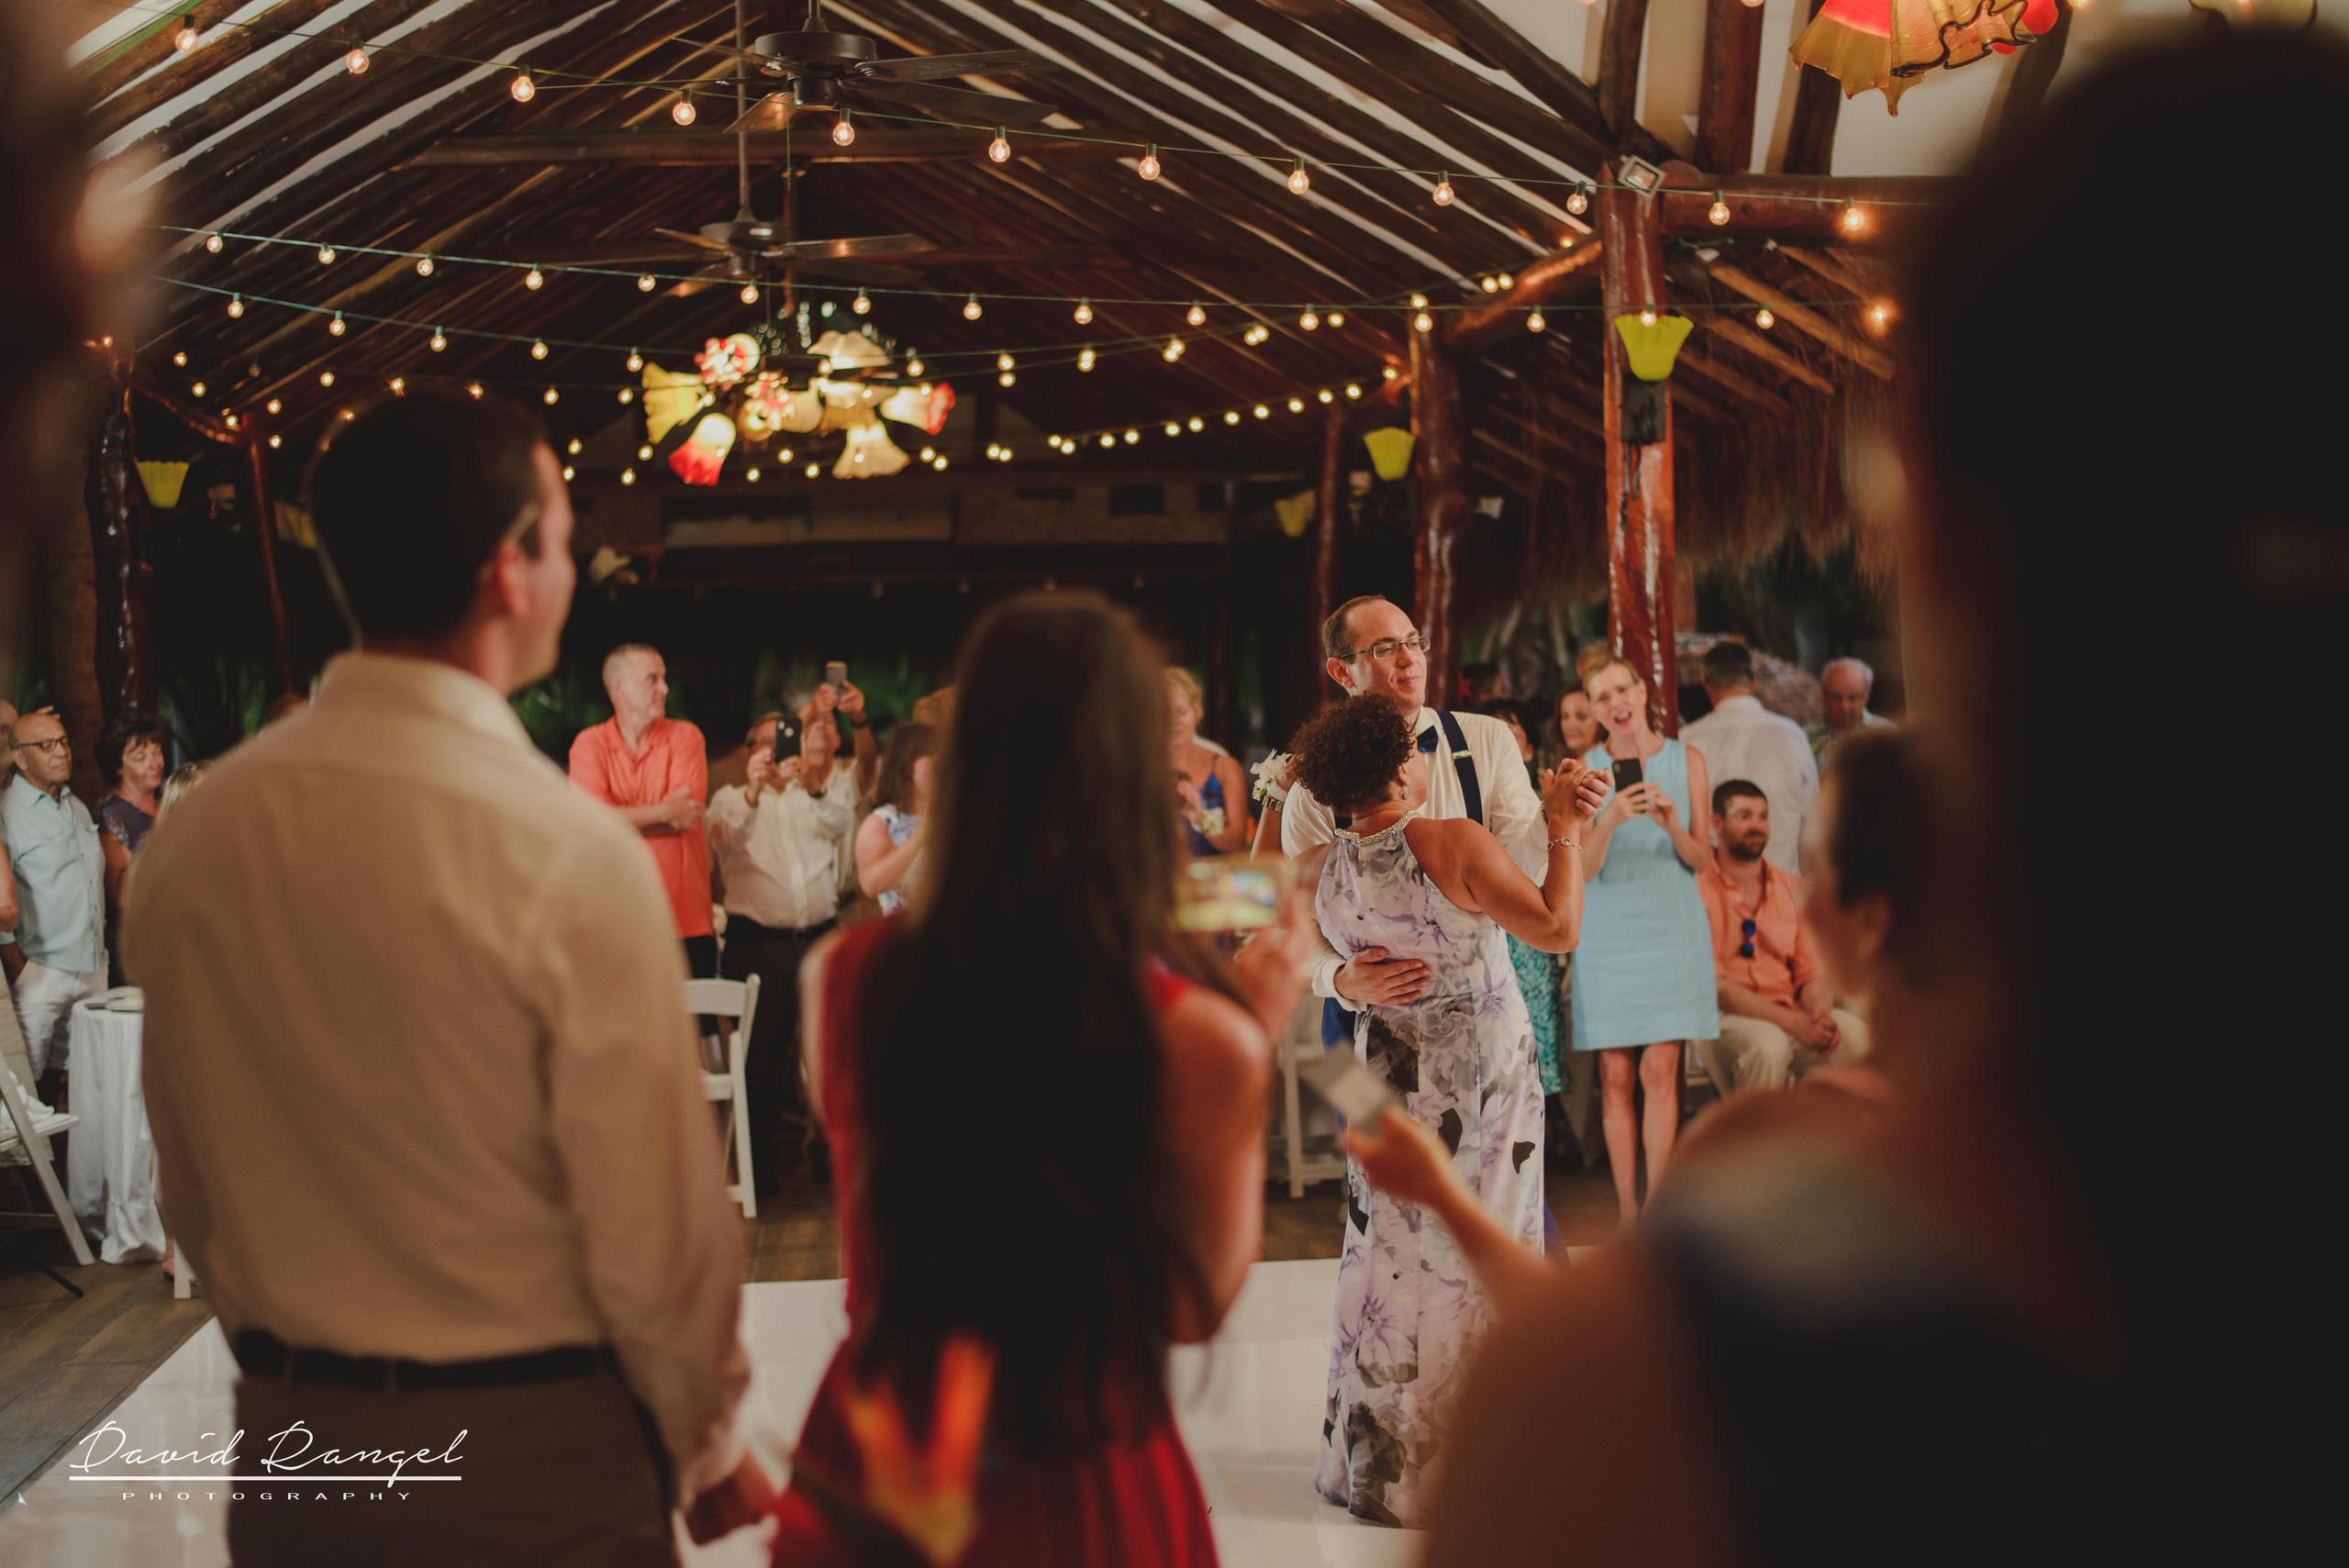 bridal+party+first+dance+bridal+party+first+dance+reception+groom+mother+floorreception+couple+bride+groom+floor